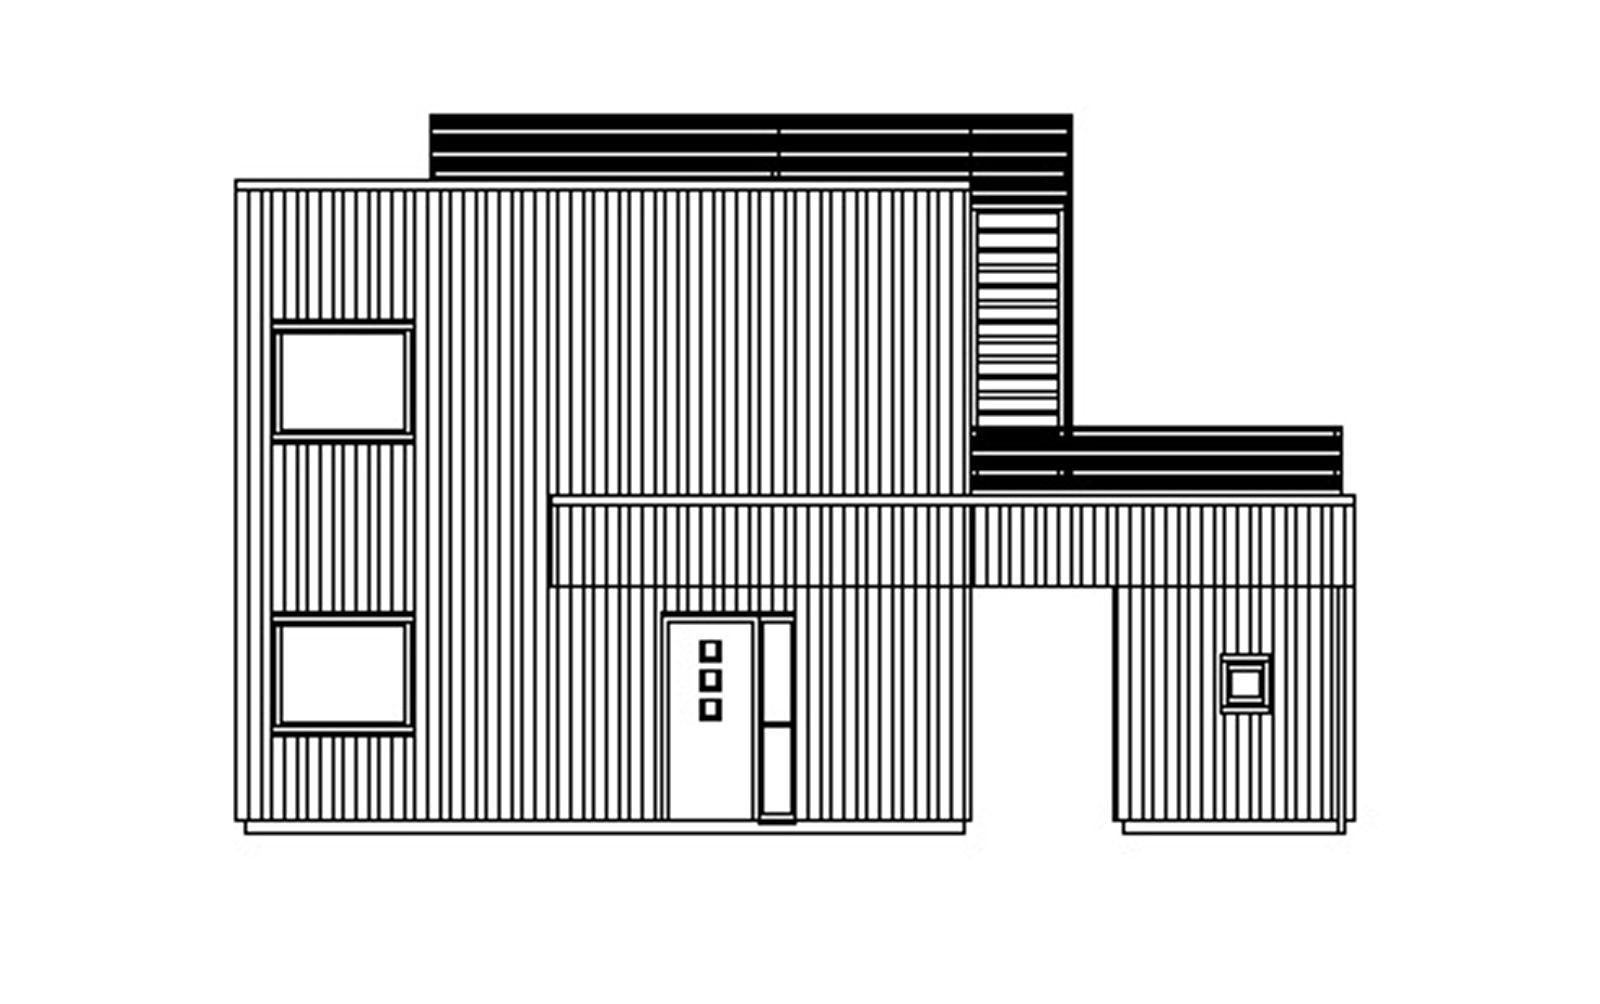 NY PRIS! Moderne enebolig over 2 plan. Carport og sportsbod integrert i bygningskroppen